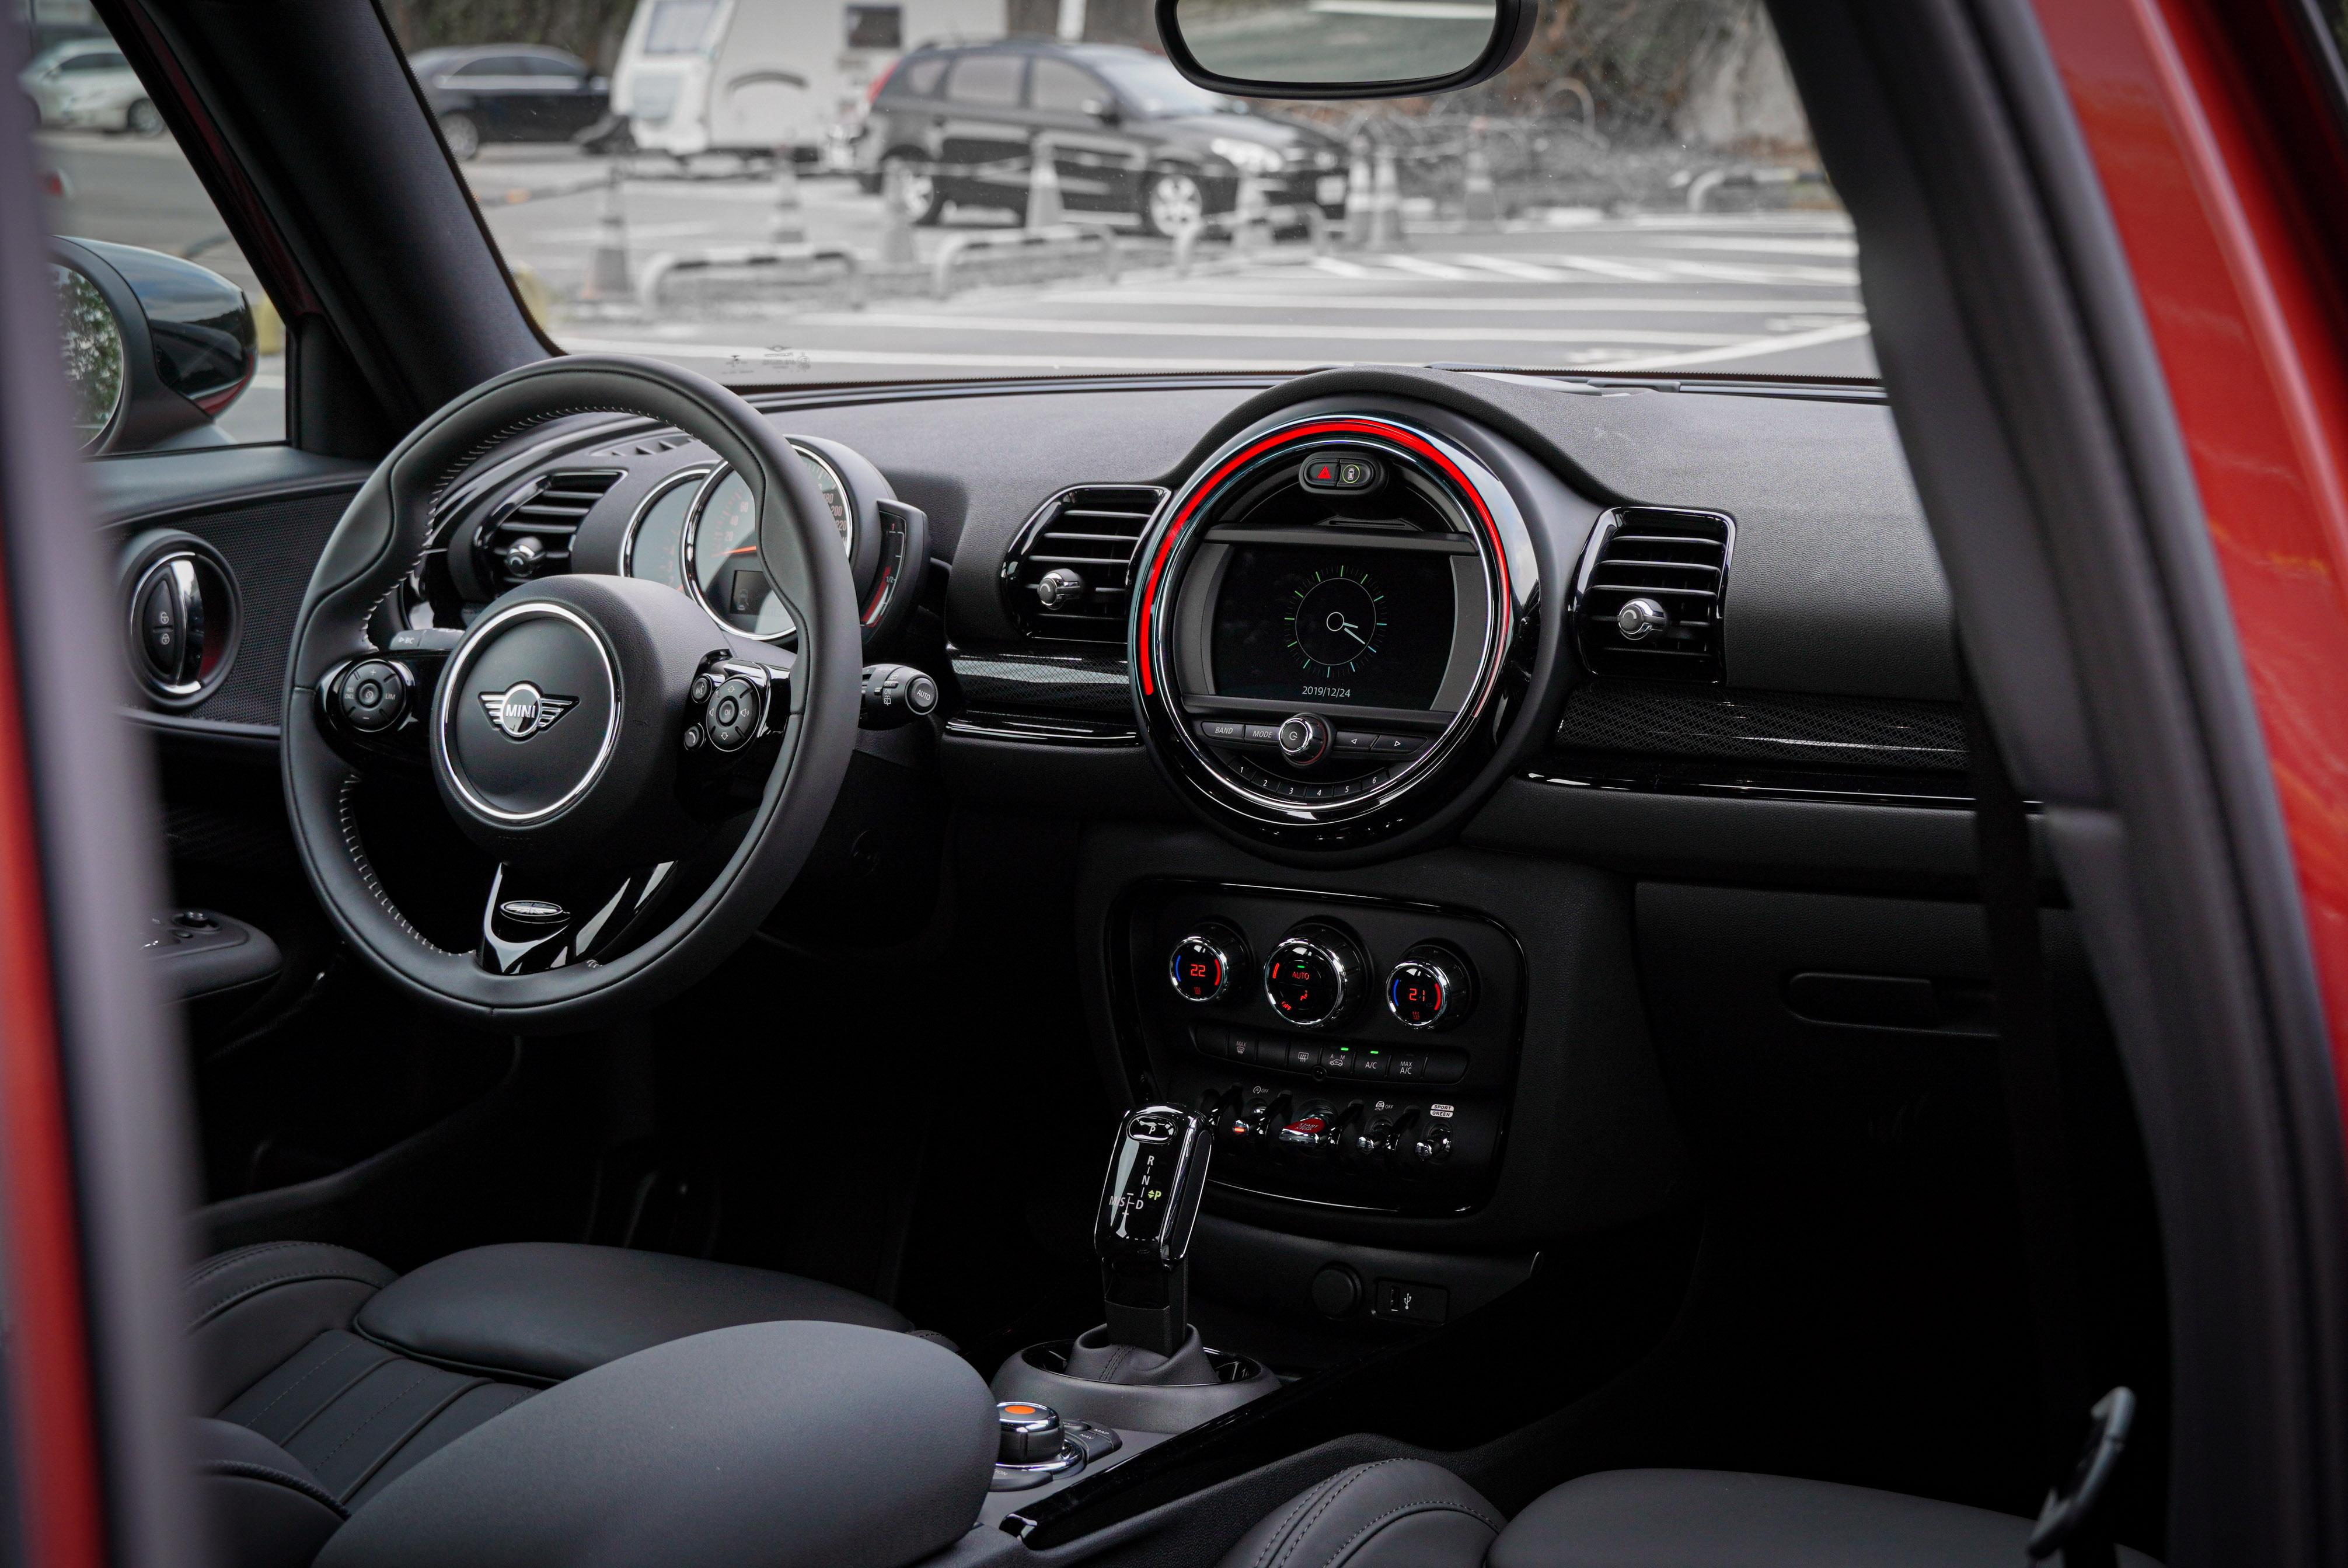 Clubman 標配跑車式多功能真皮方向盤,試駕車選配 Mini Yours 跑車式真皮方向盤。